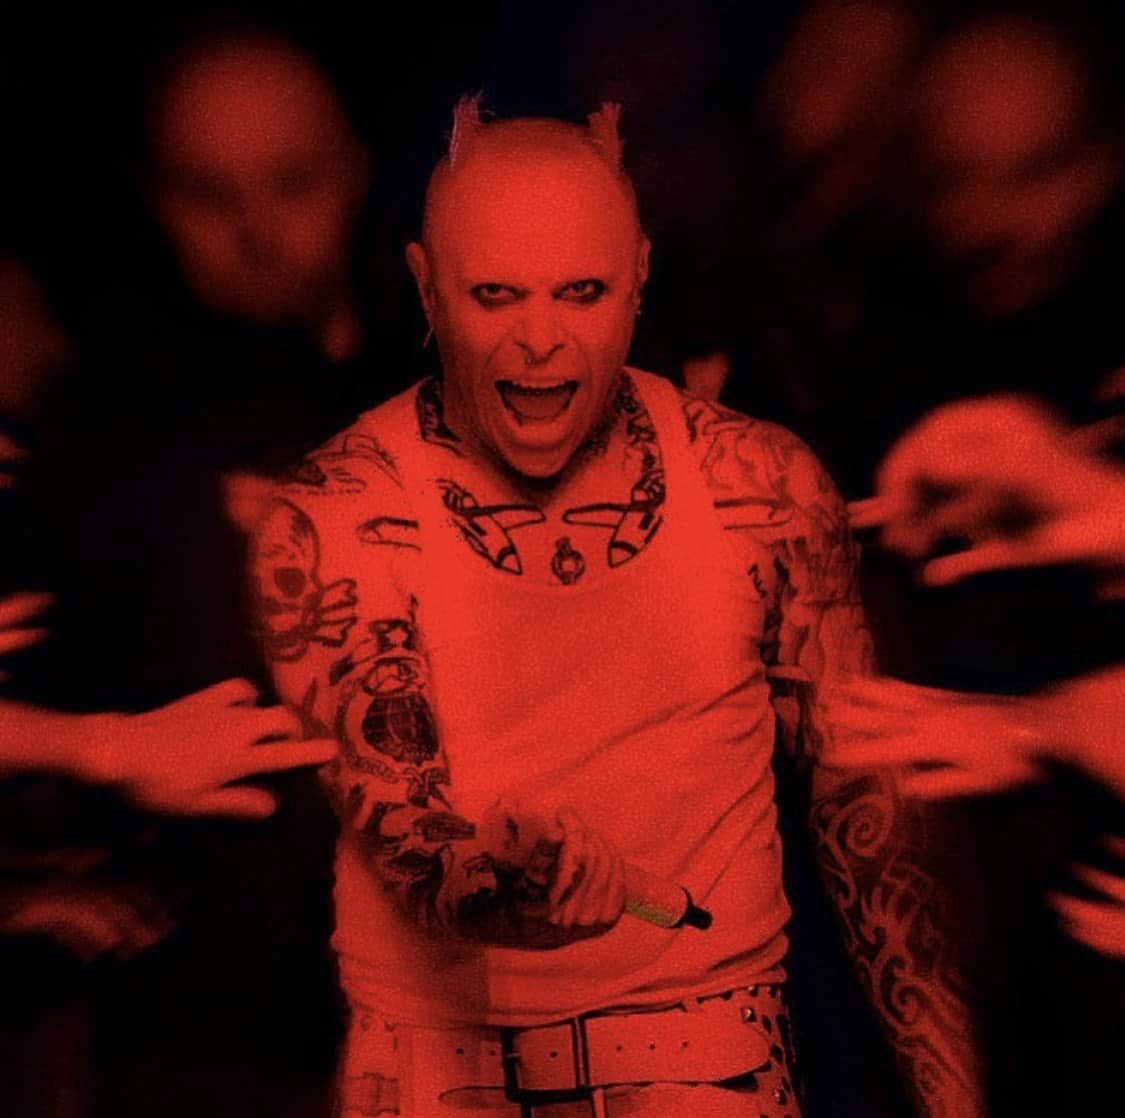 Prodigy vocalist dies aged 49